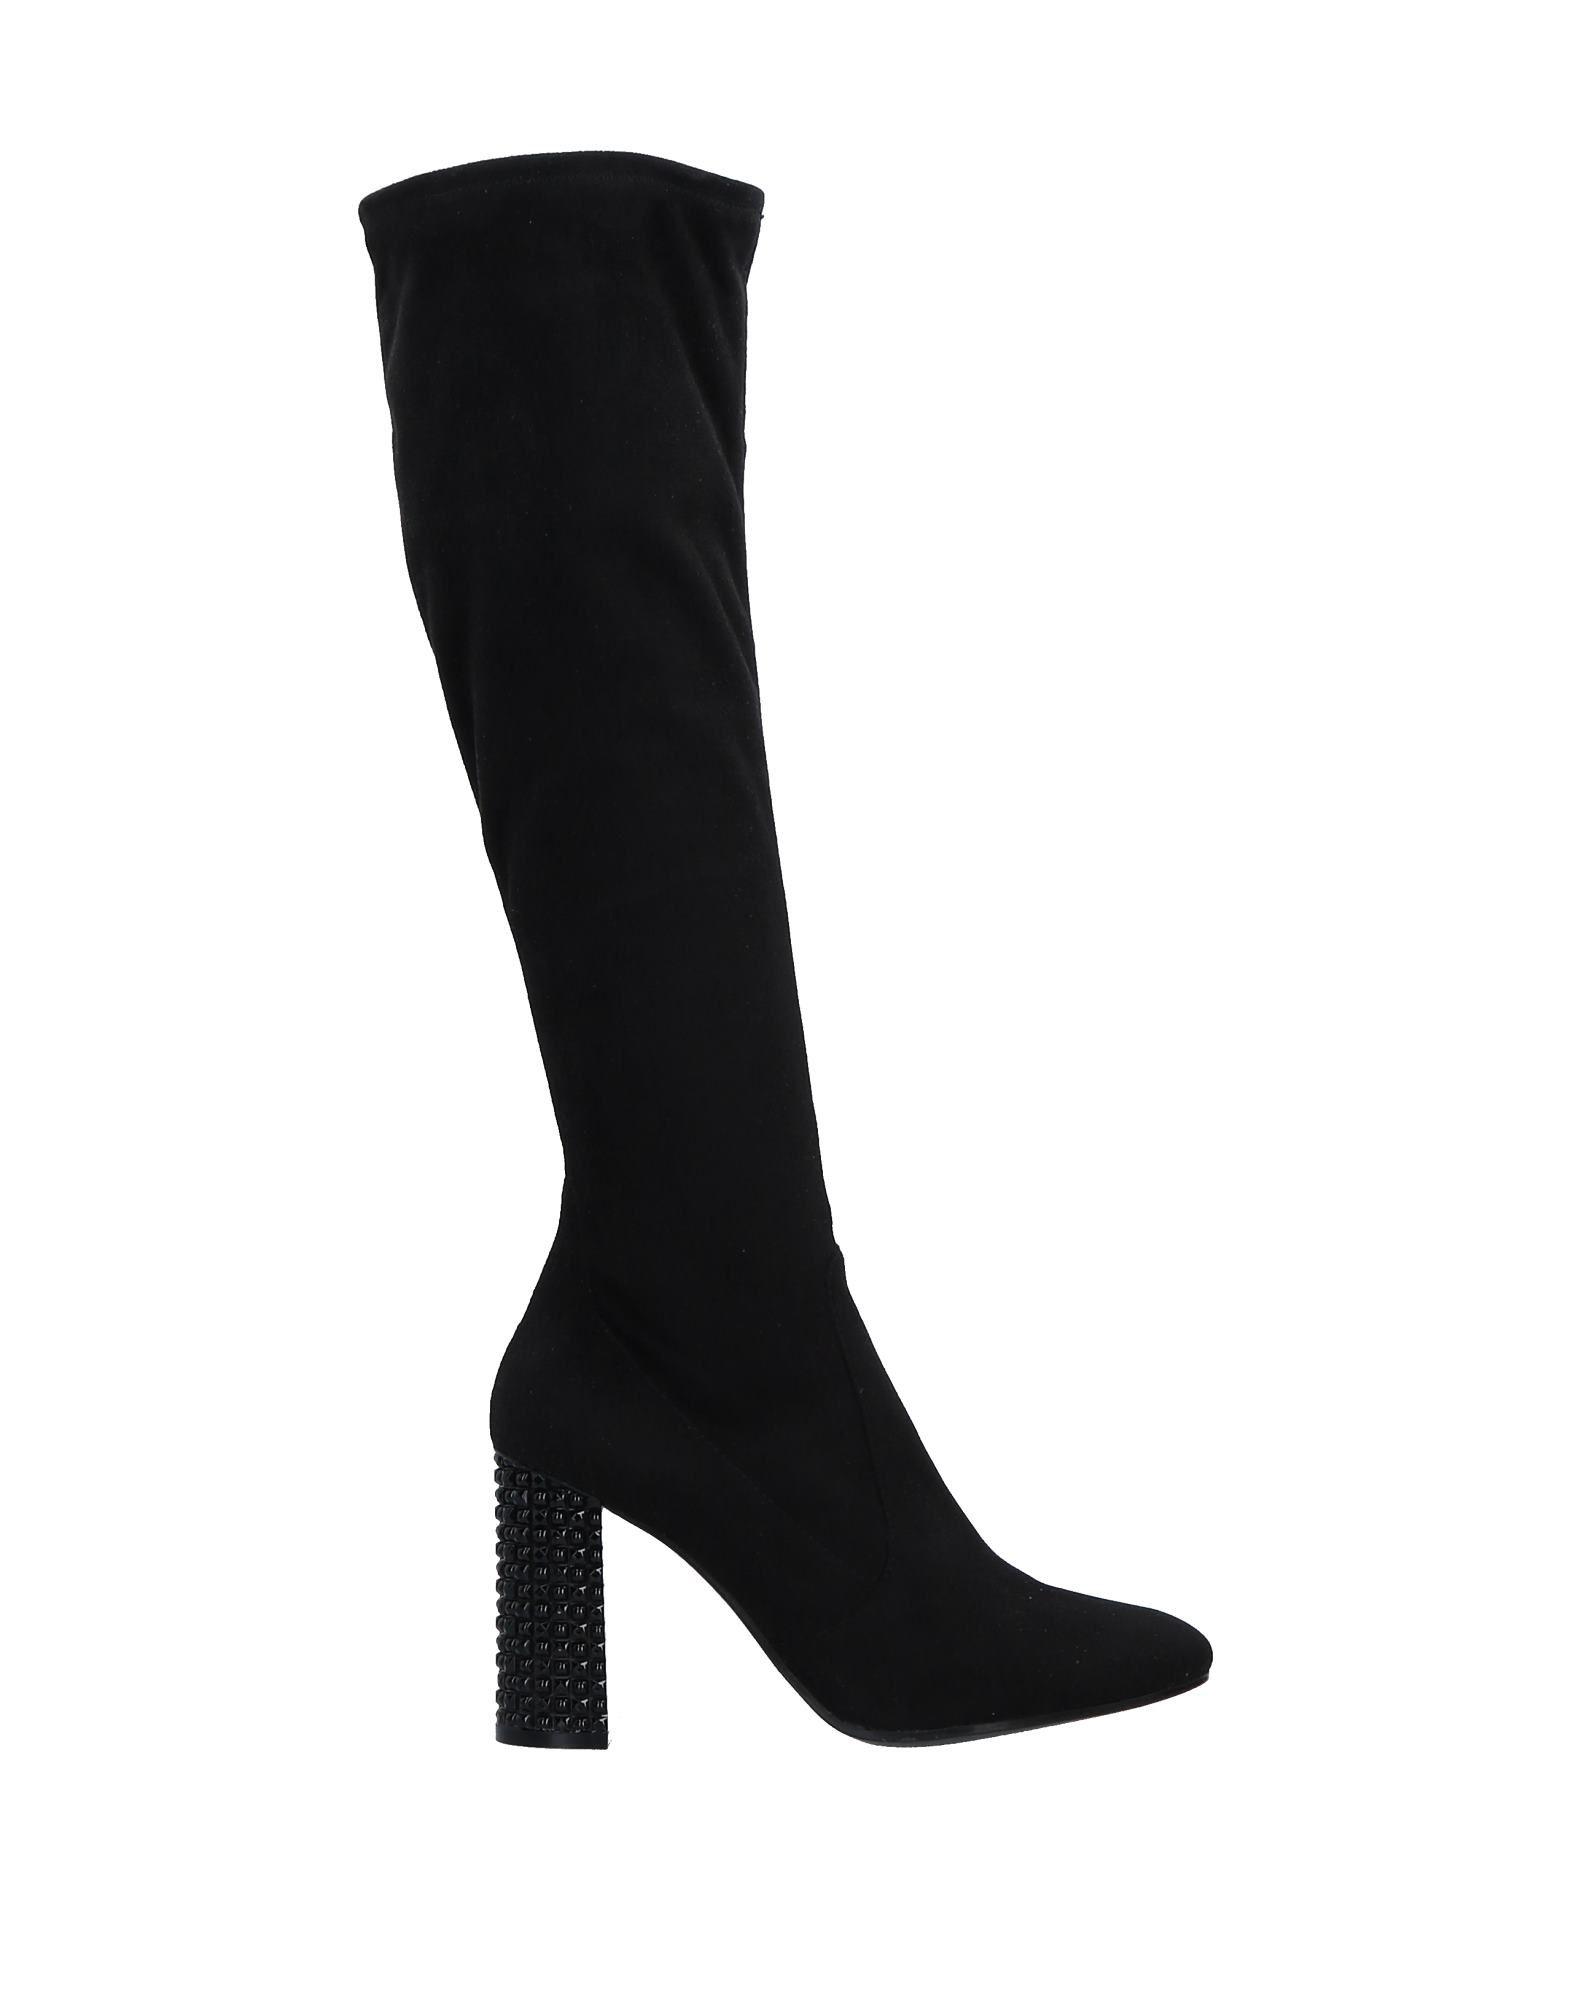 Stilvolle Premi billige Schuhe Bruno Premi Stilvolle Stiefel Damen  11531315OG 09d232